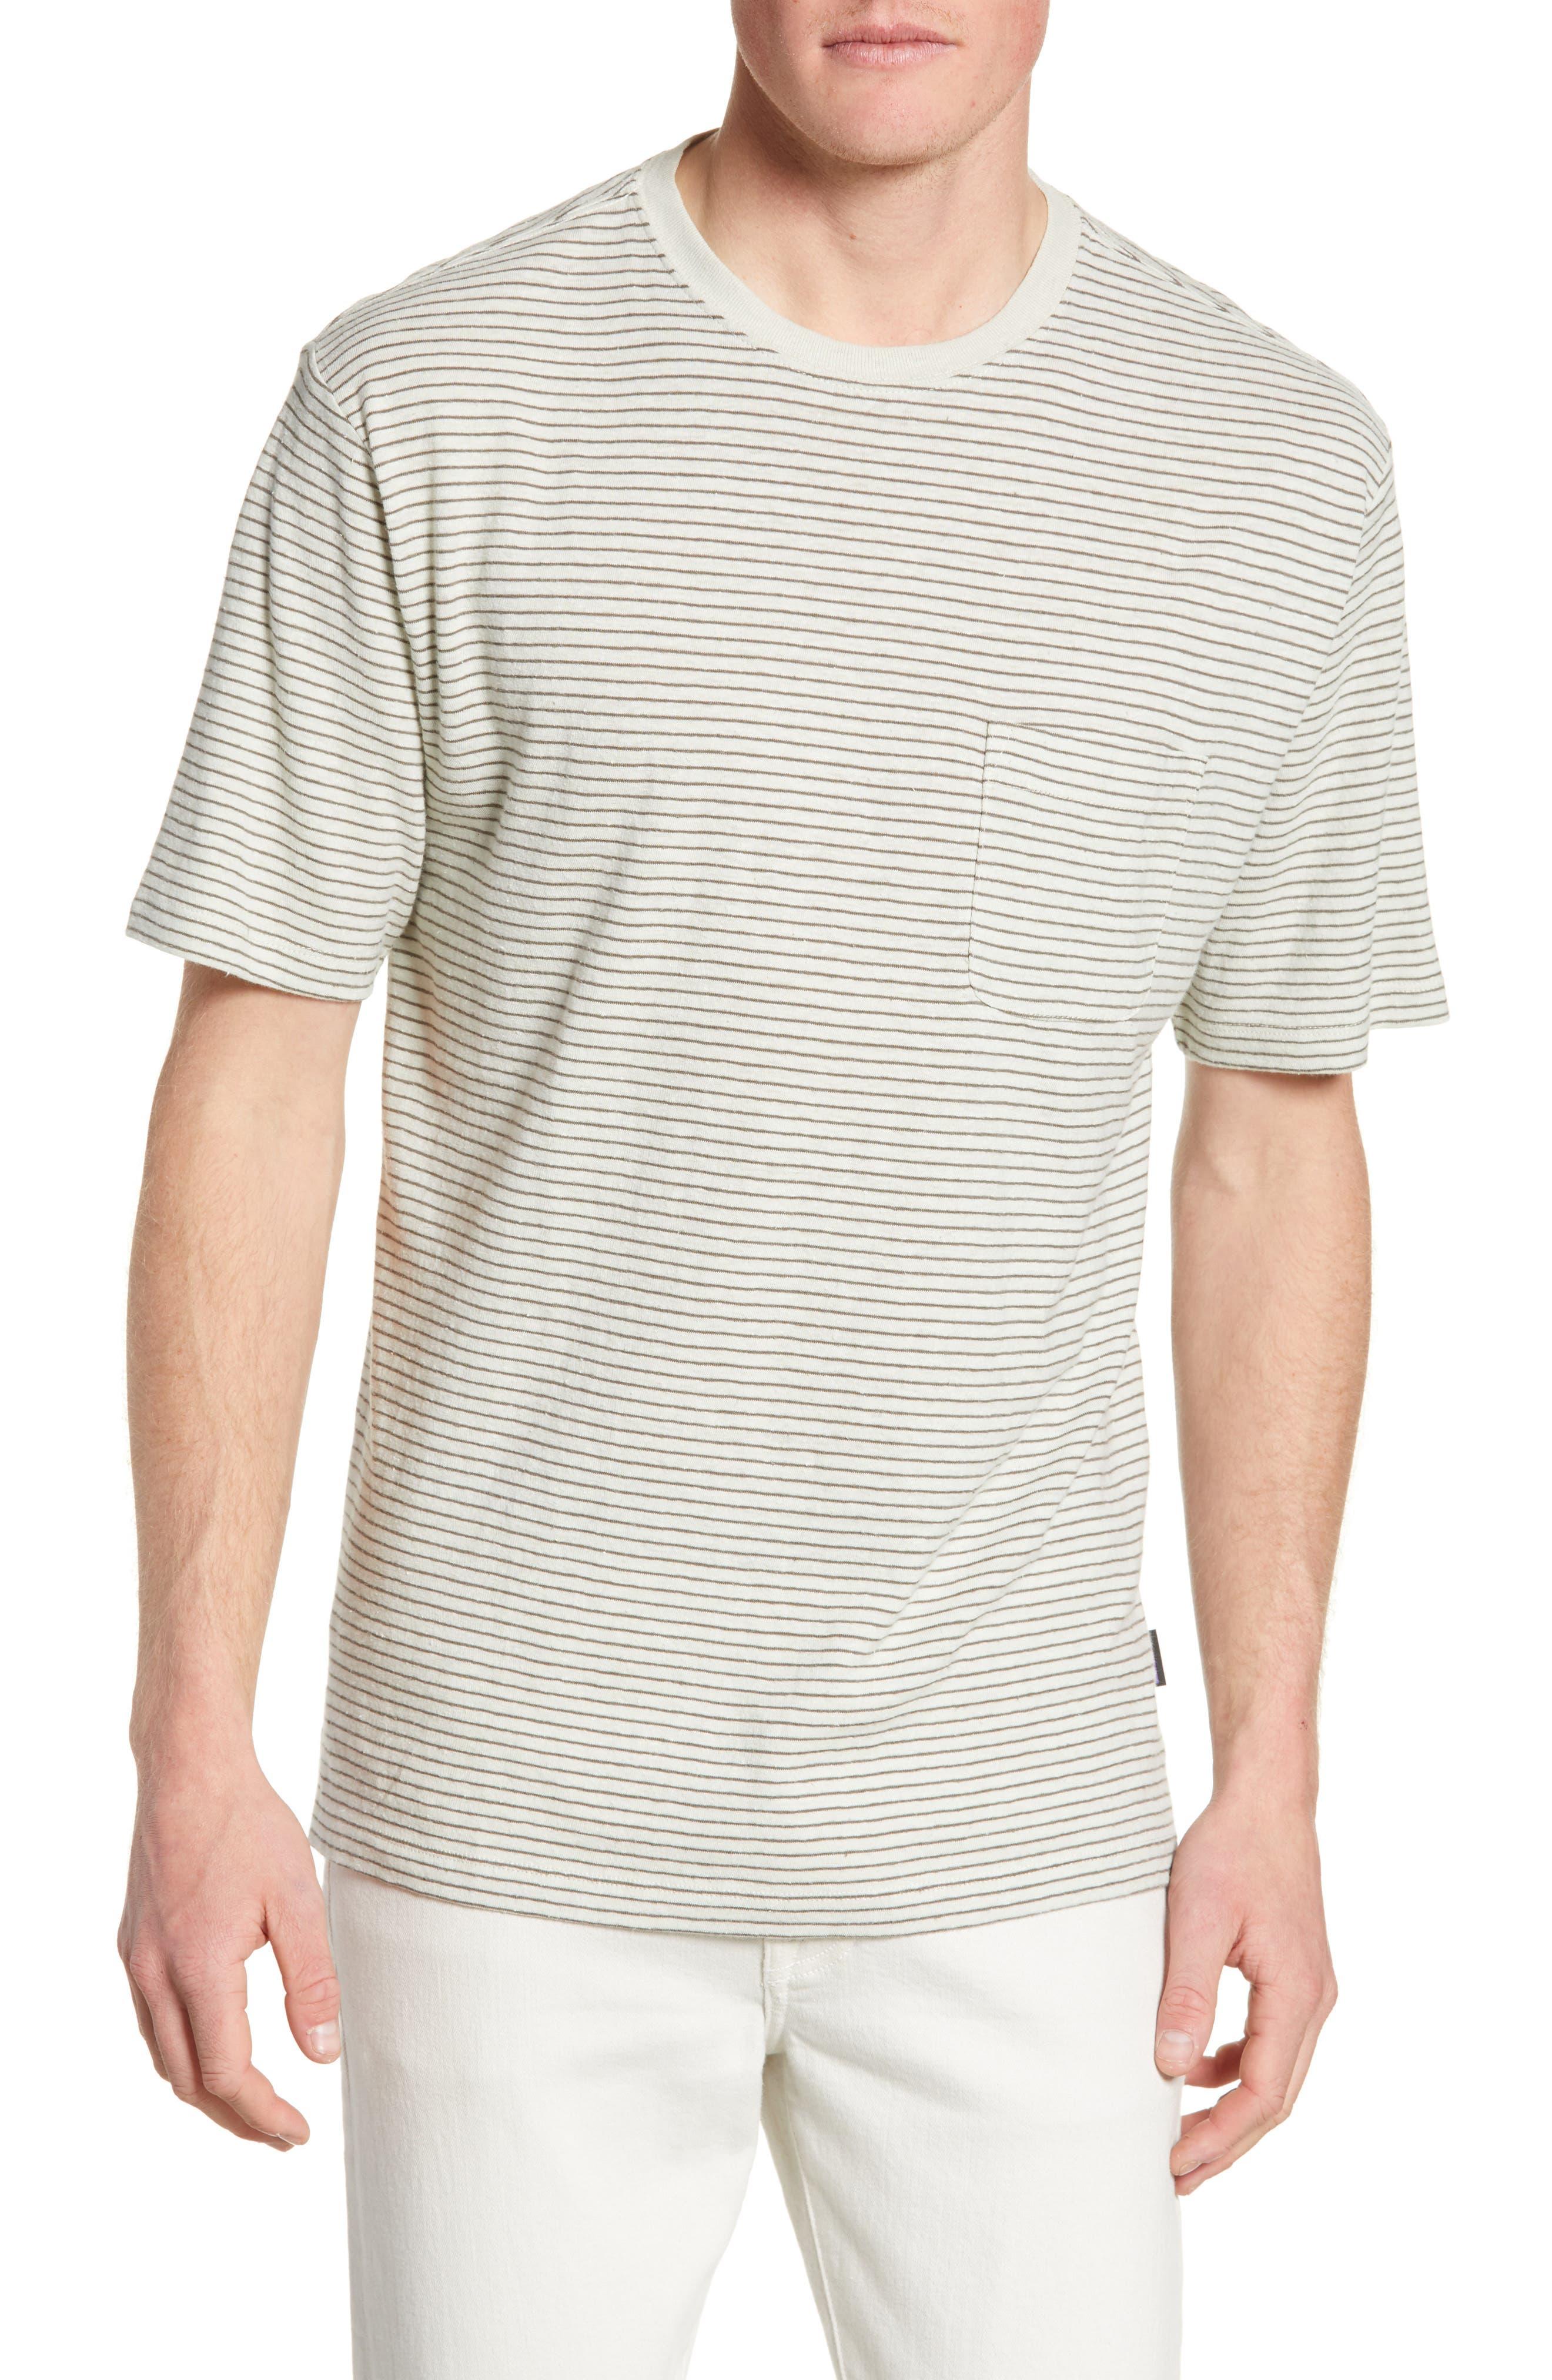 Patagonia Trail Harbor Stripe Pocket T-Shirt, White